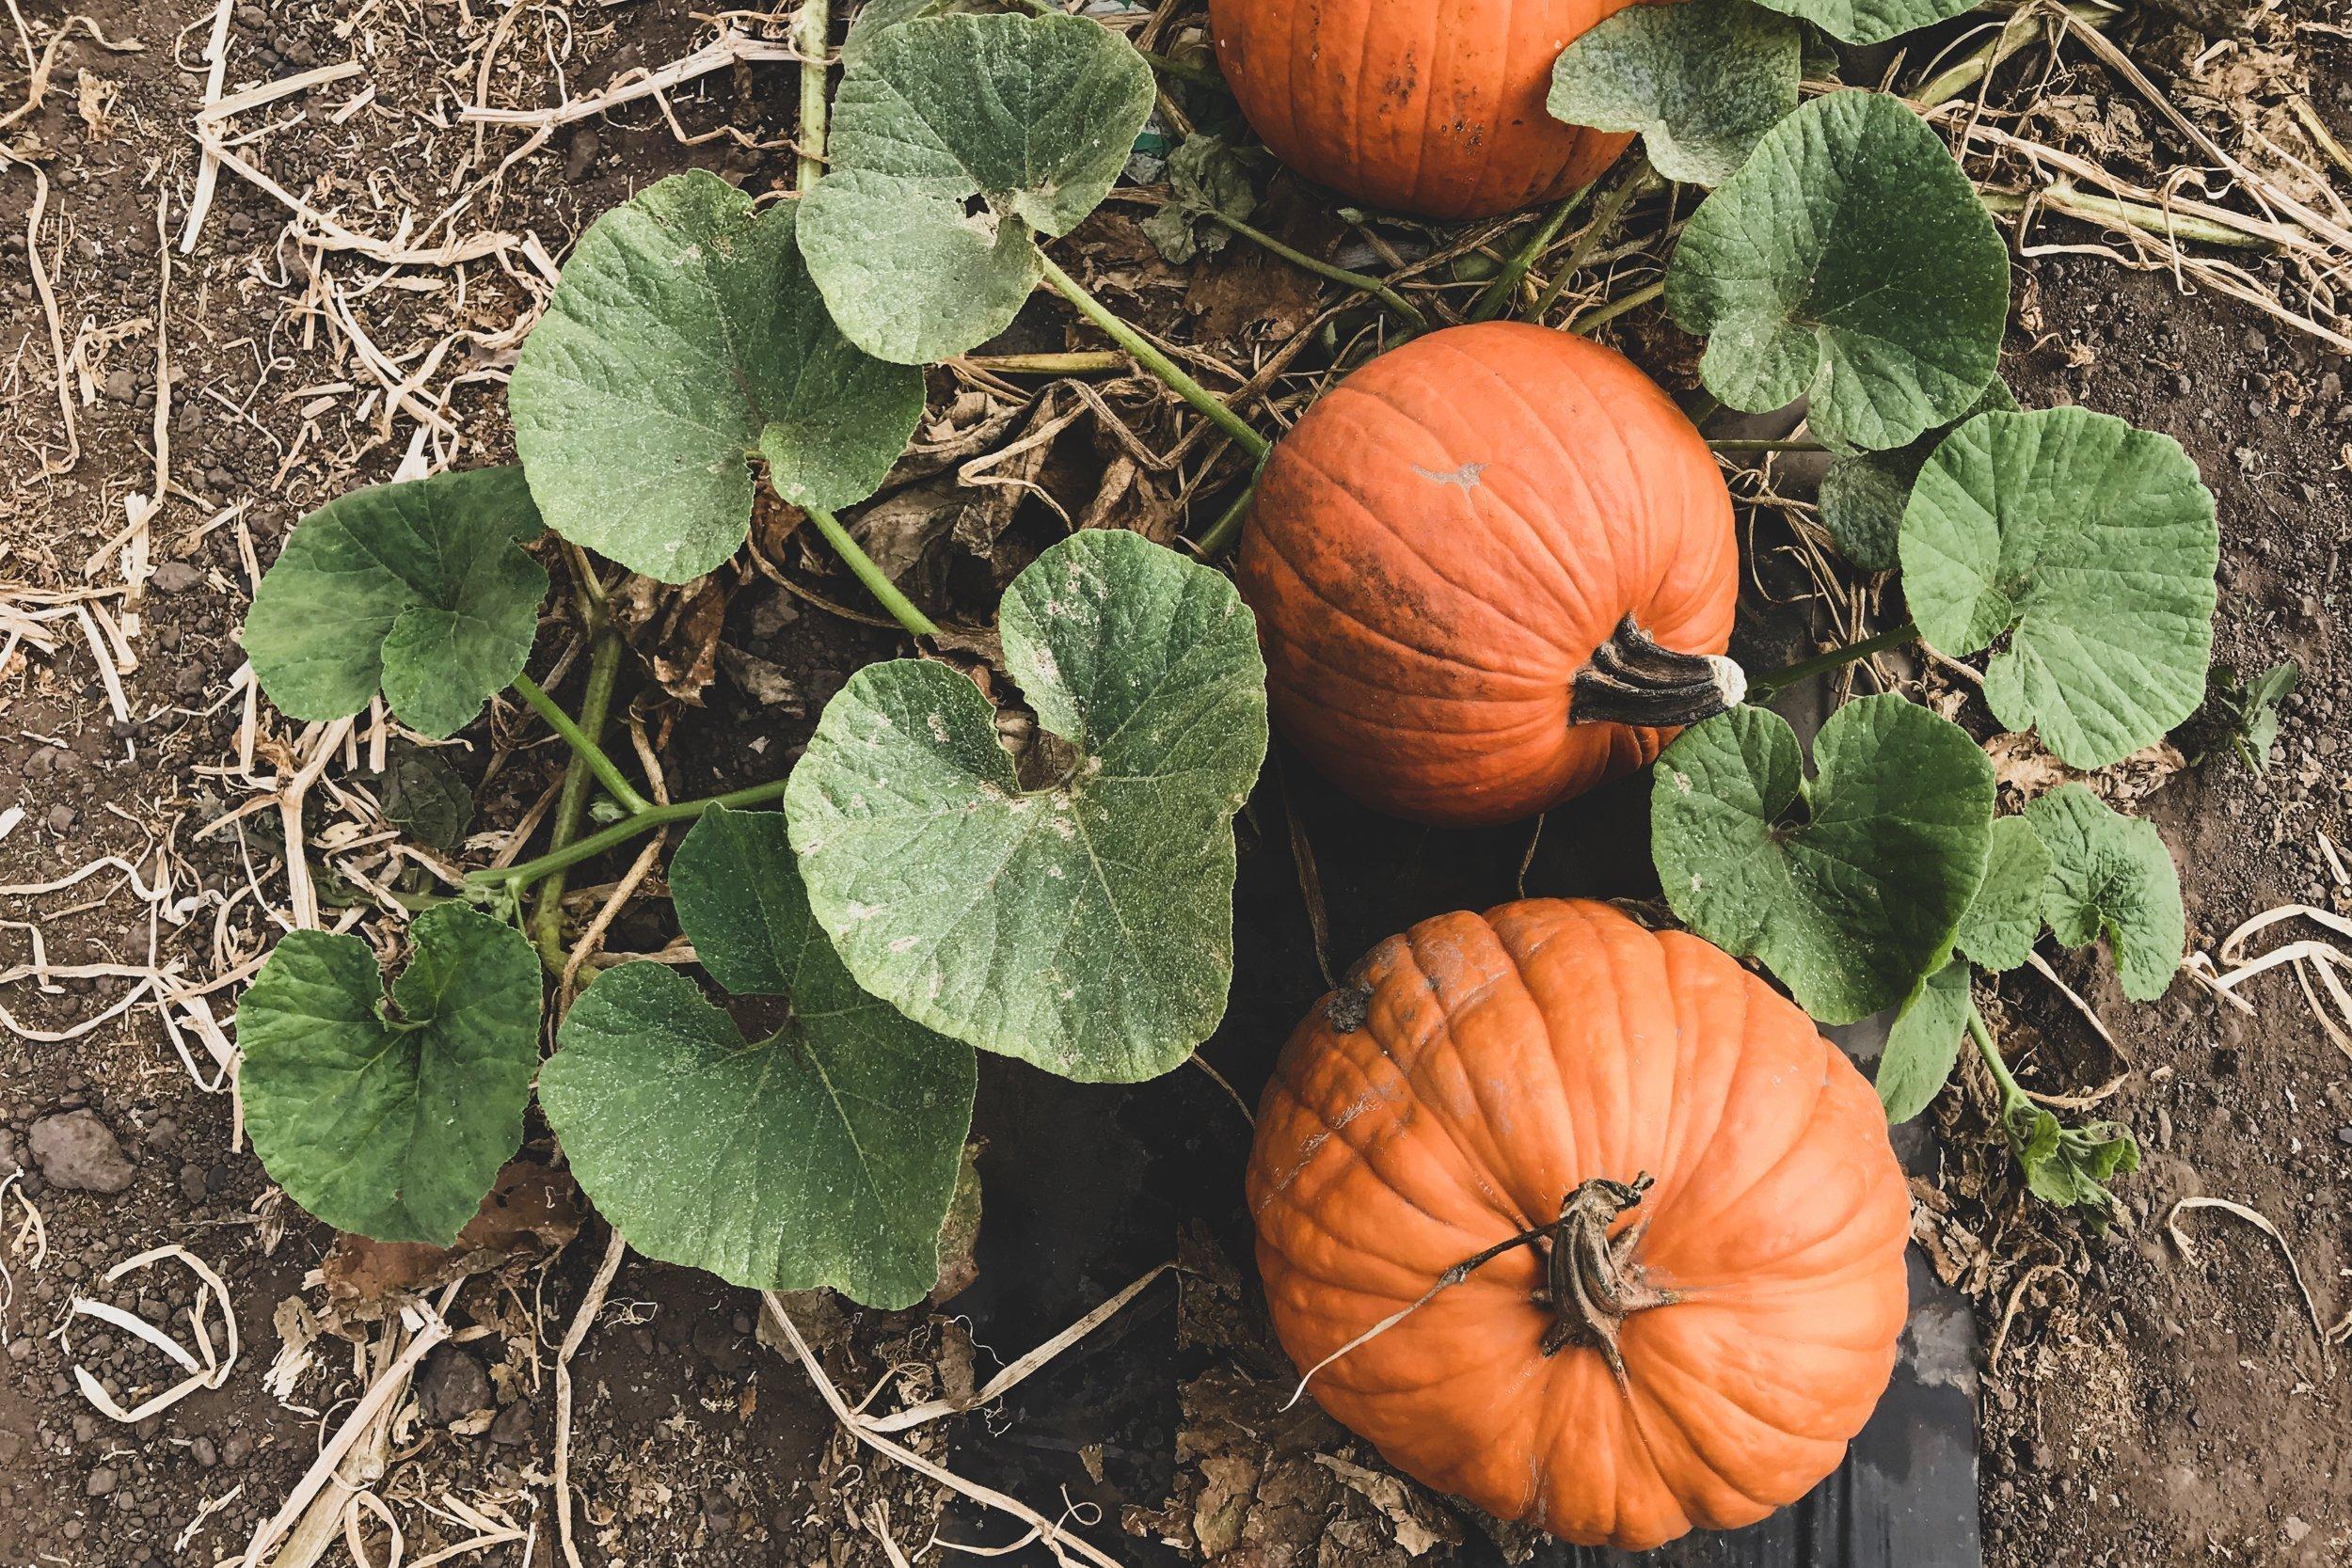 Three Pumpkins On Soil